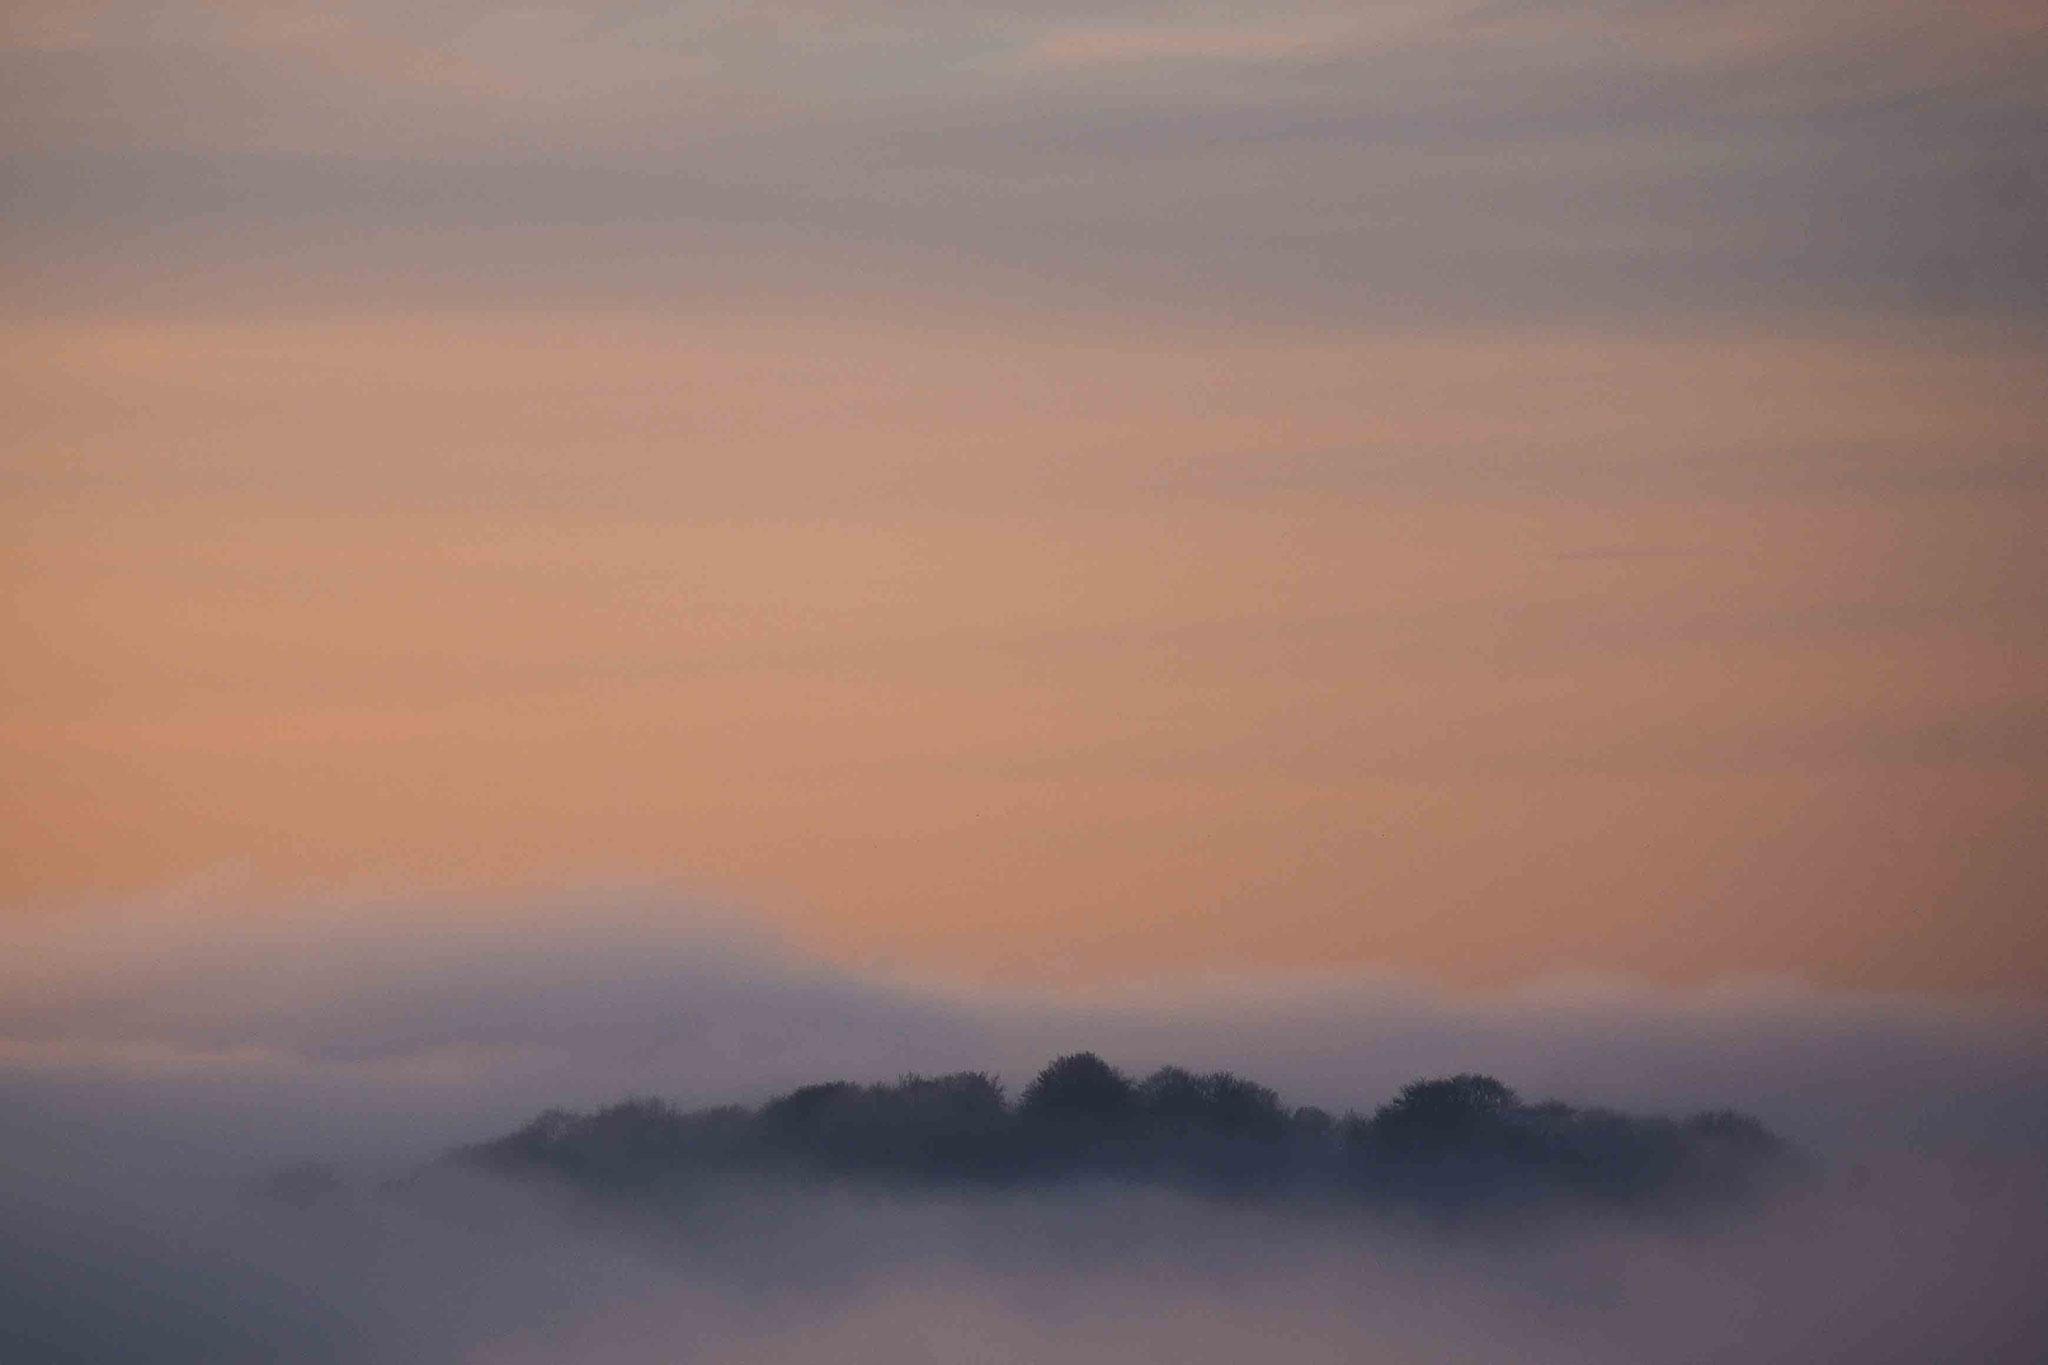 Nebelmeer zur Morgenstunde; Schwäbische Alb